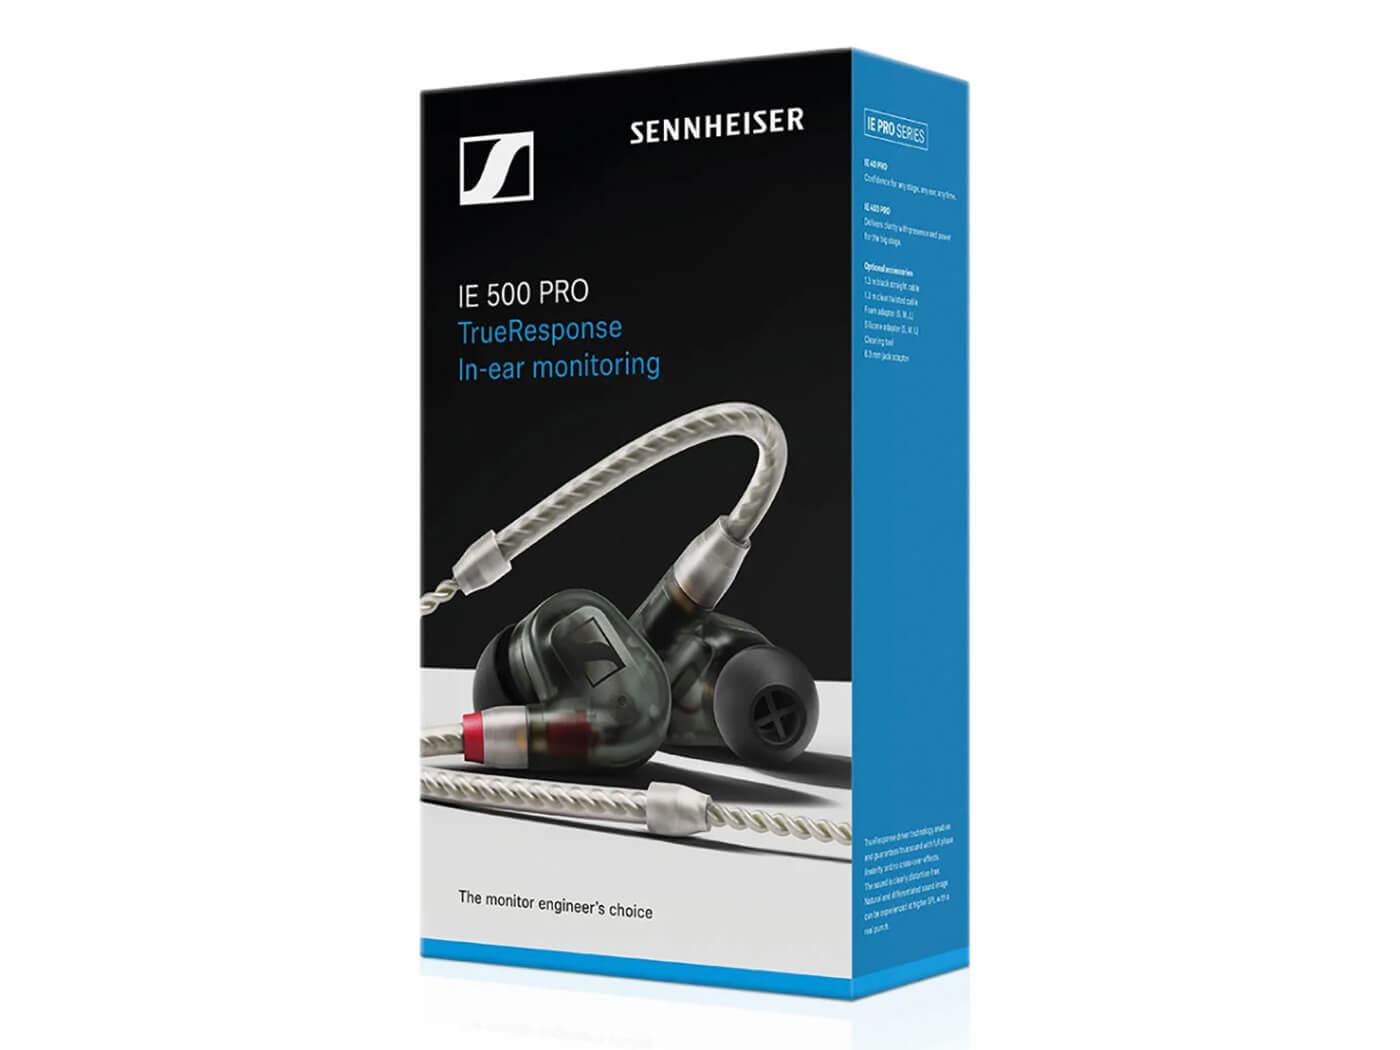 Sennheiser IE 500 Pro Box